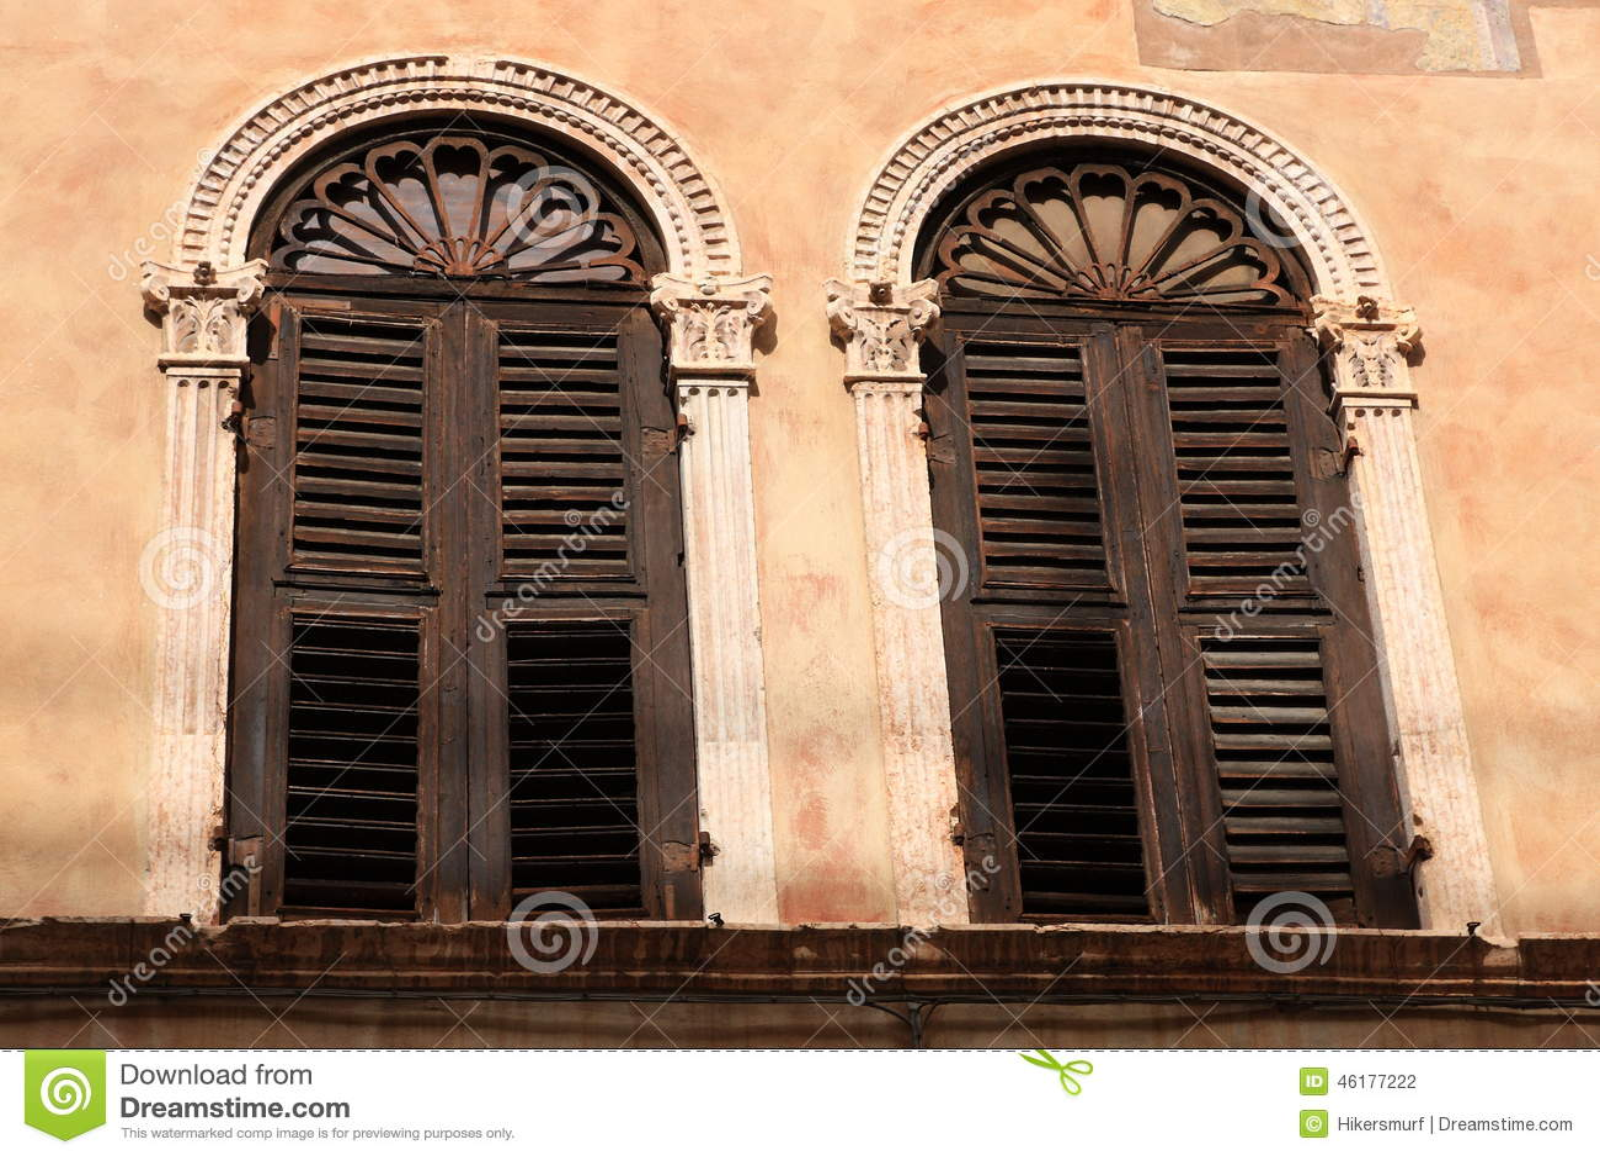 Finestre veneziane fotografia stock immagine 46177222 - Veneziane per finestre ...